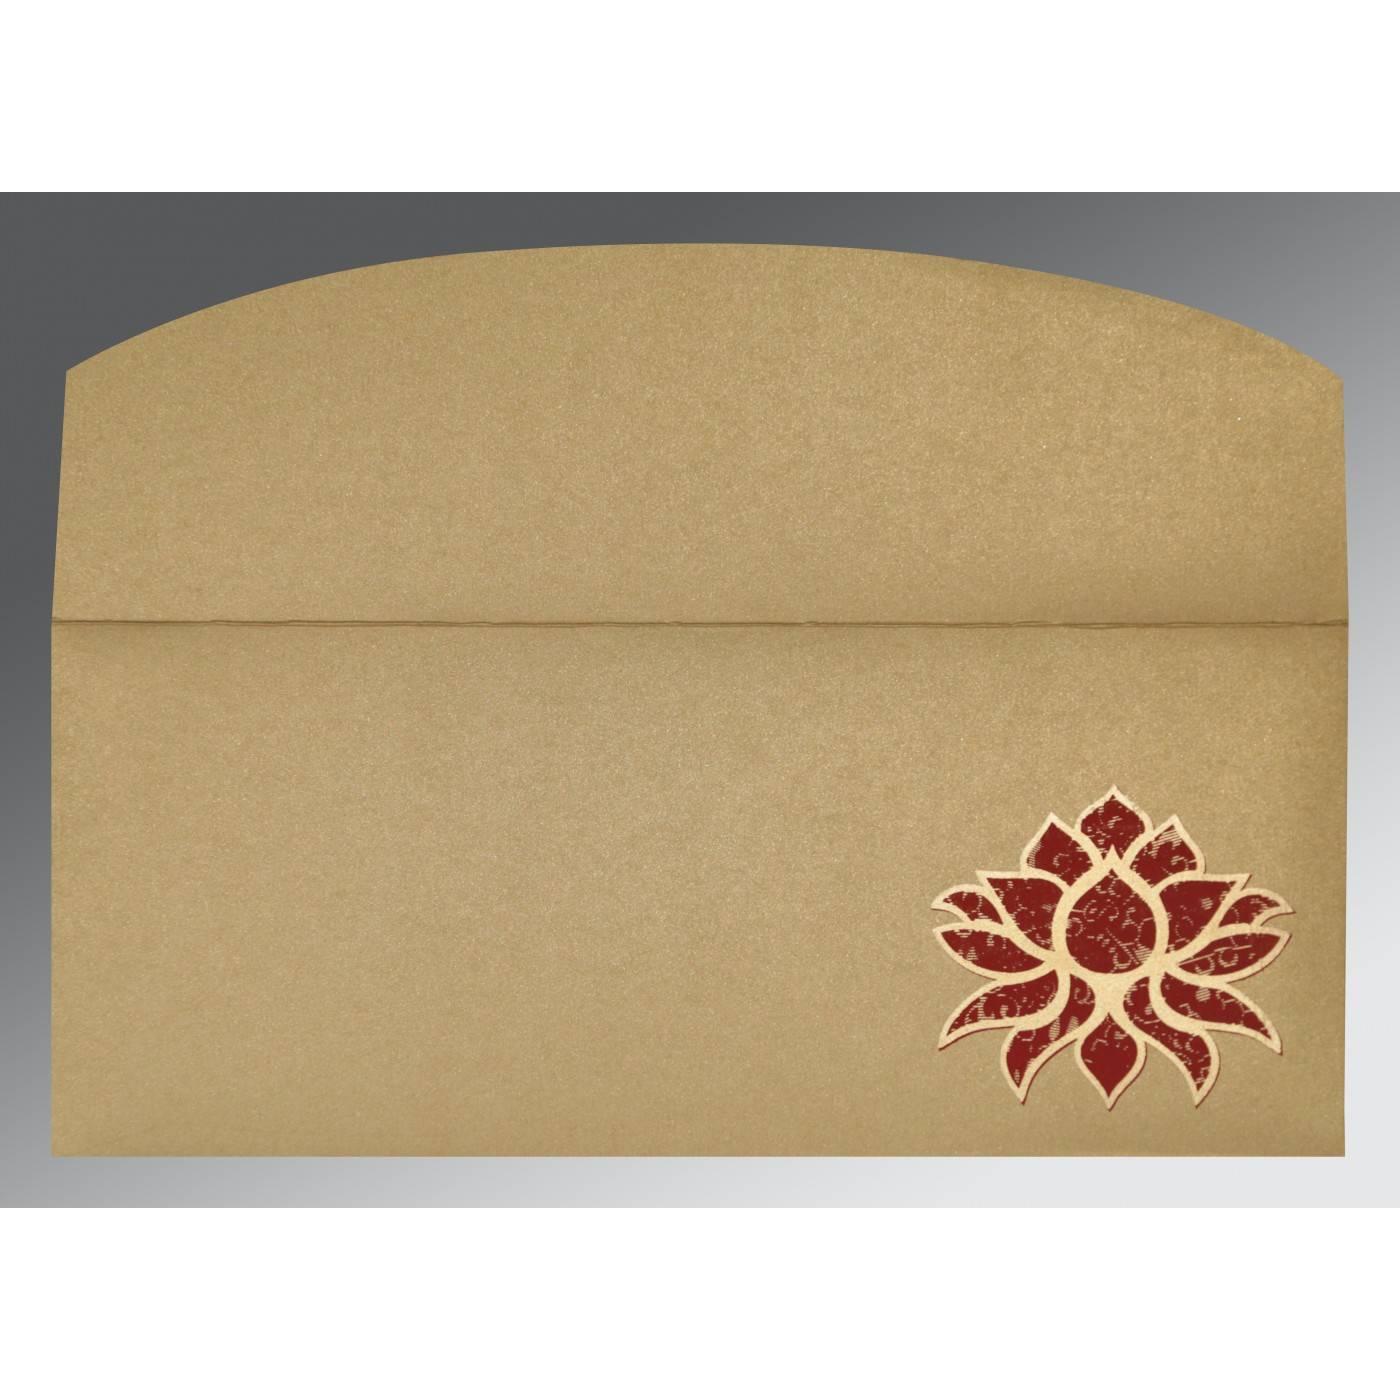 OLIVE GREEN SHIMMERY SCREEN PRINTED WEDDING INVITATION : CW-1449 - IndianWeddingCards